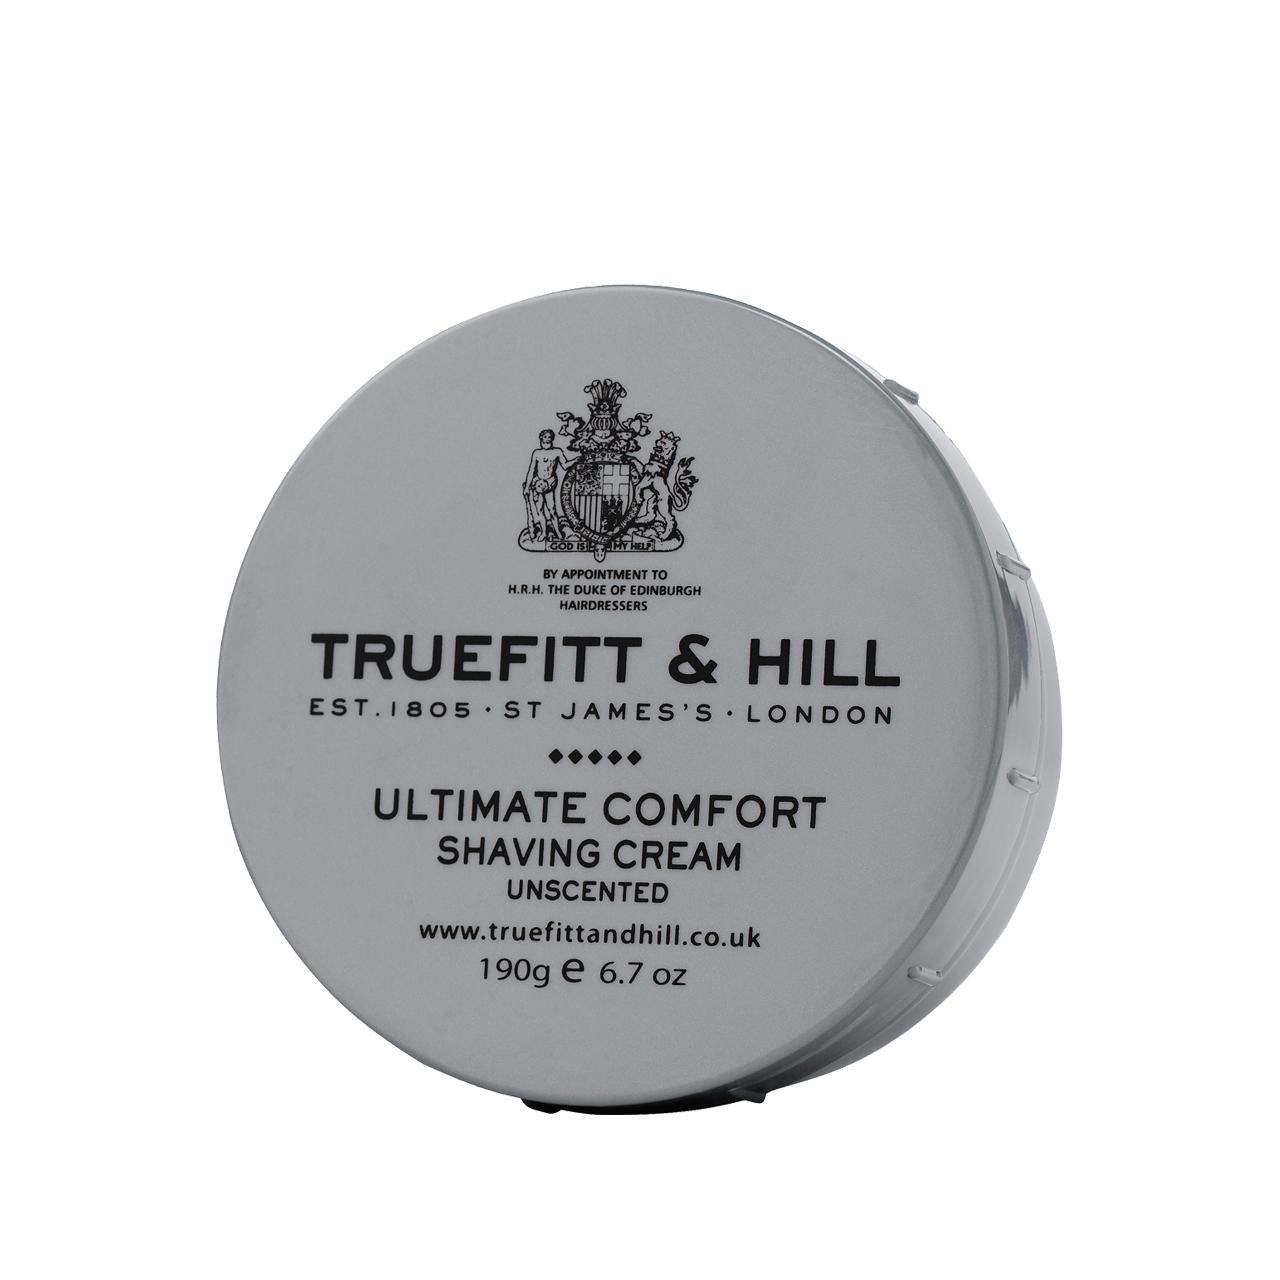 Ultimate Comfort - Shaving Cream Bowl